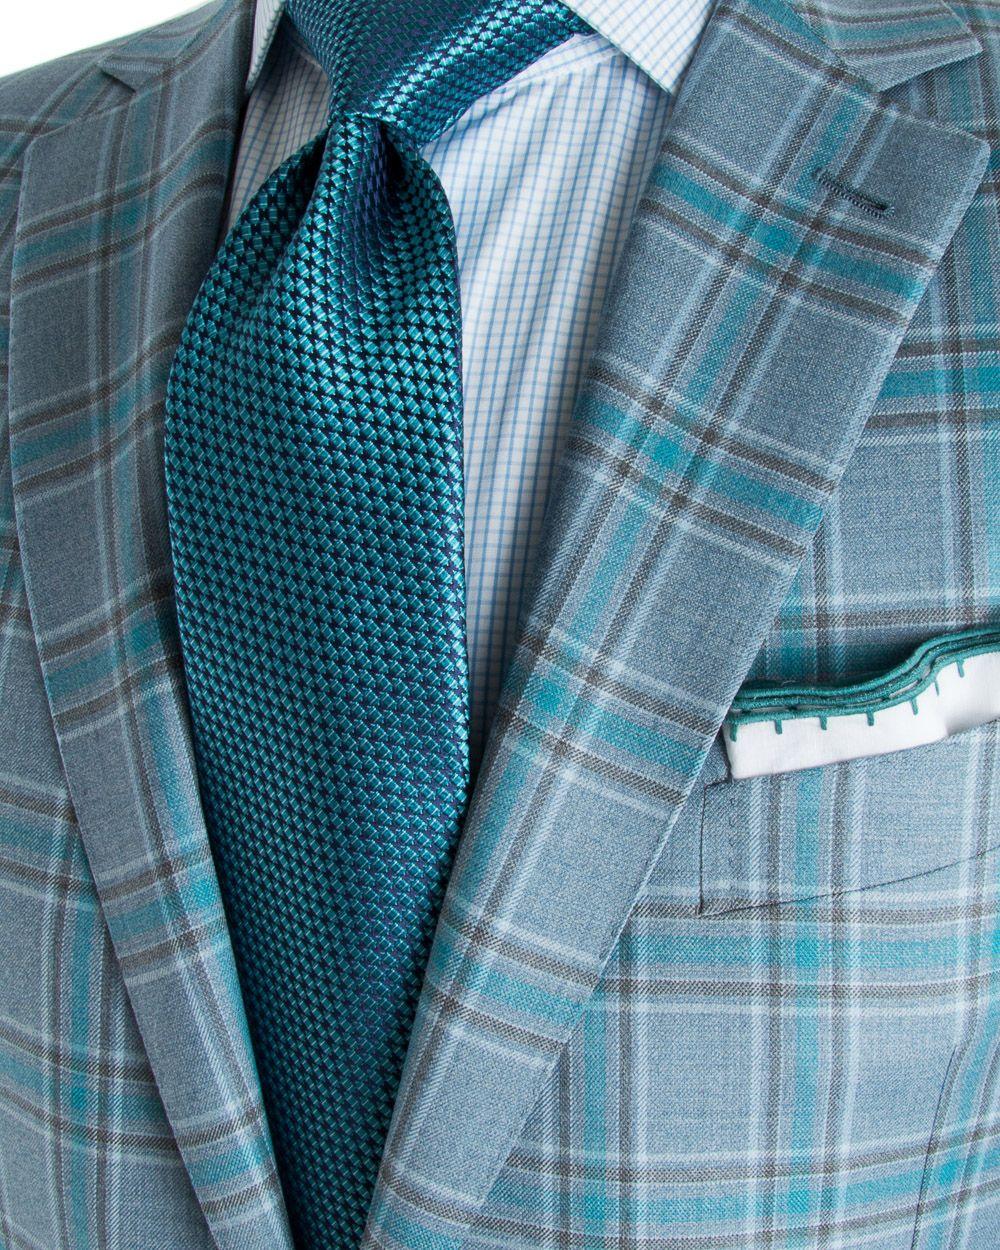 Ermenegildo Zegna   Bold Blue Grey with Teal Plaid Sportcoat   Apparel   Men's